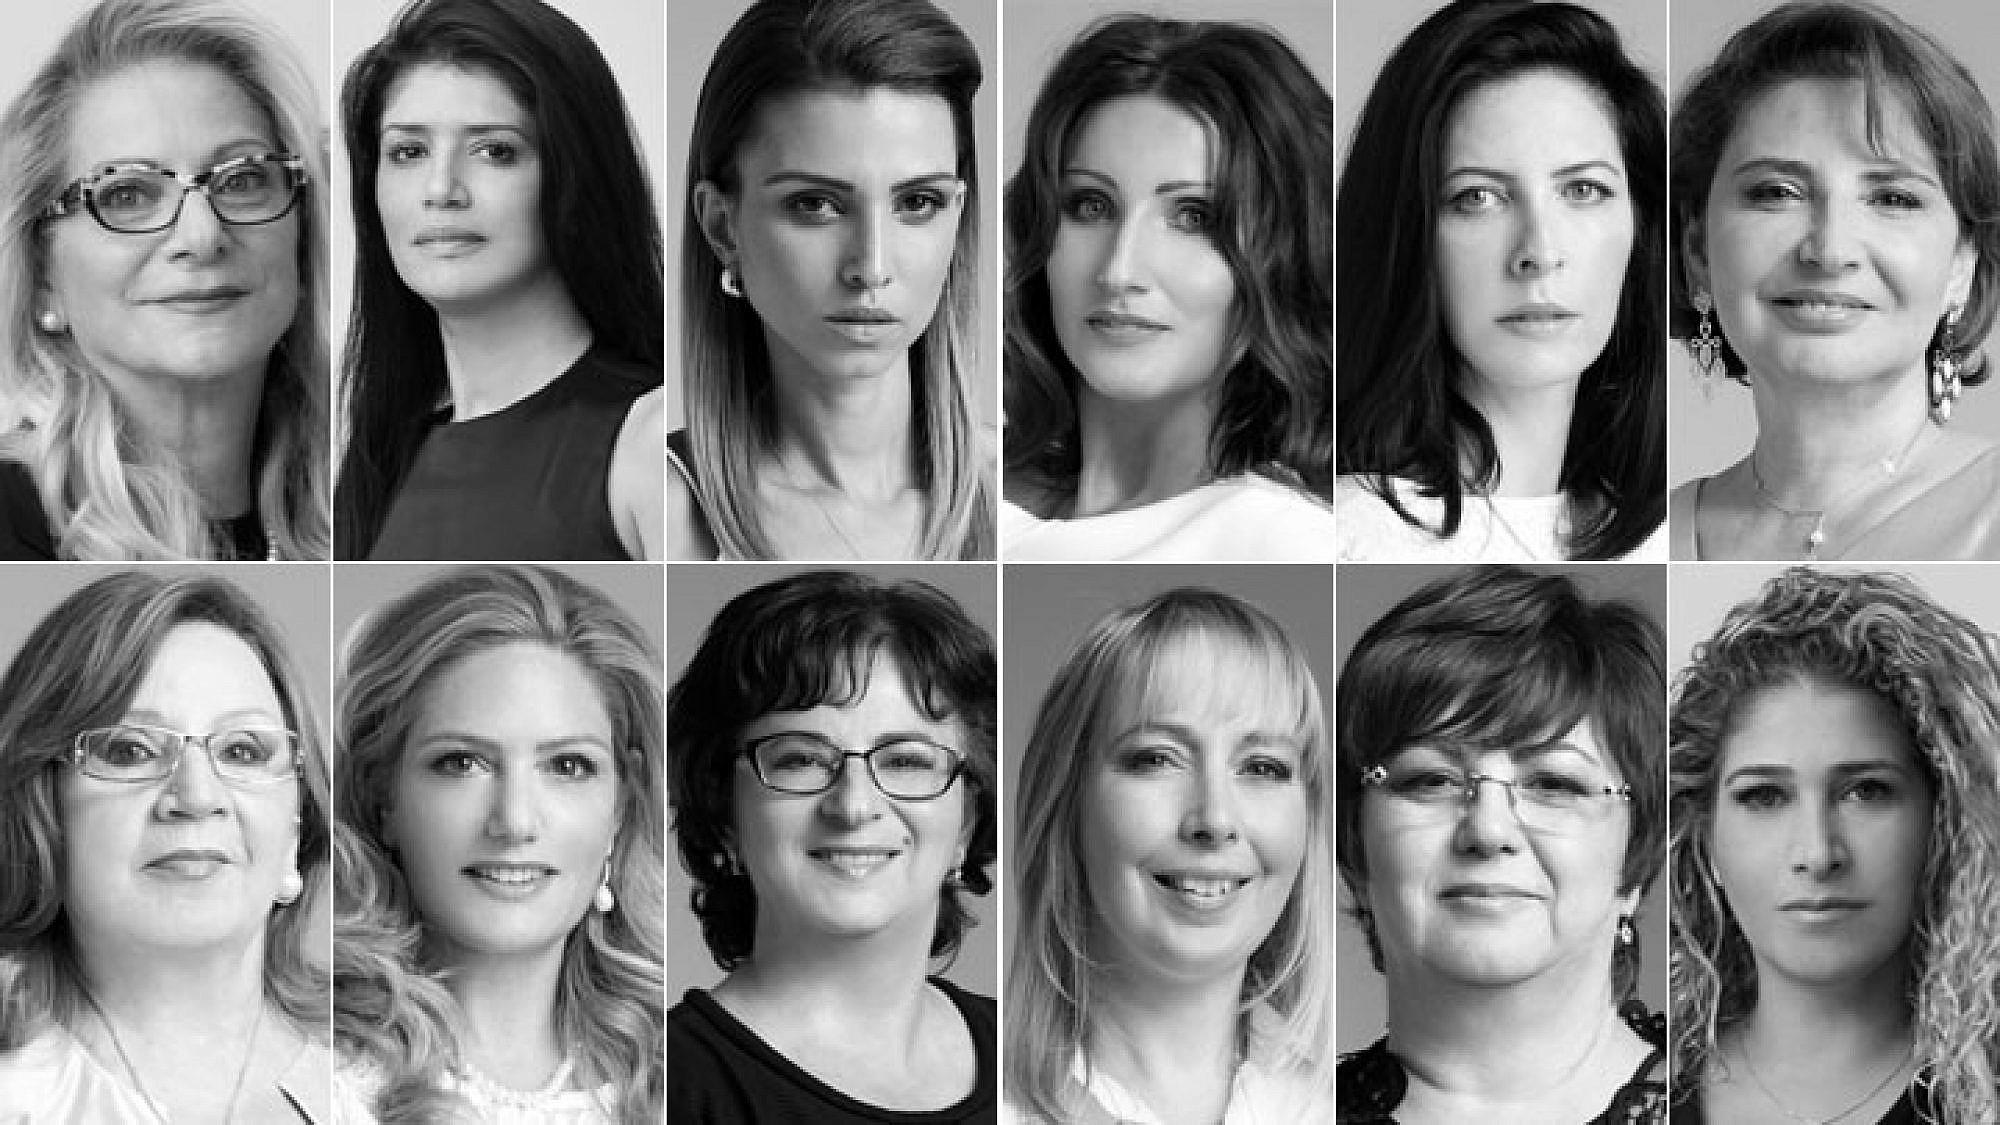 Women's Power | צילום: סם יצחקוב